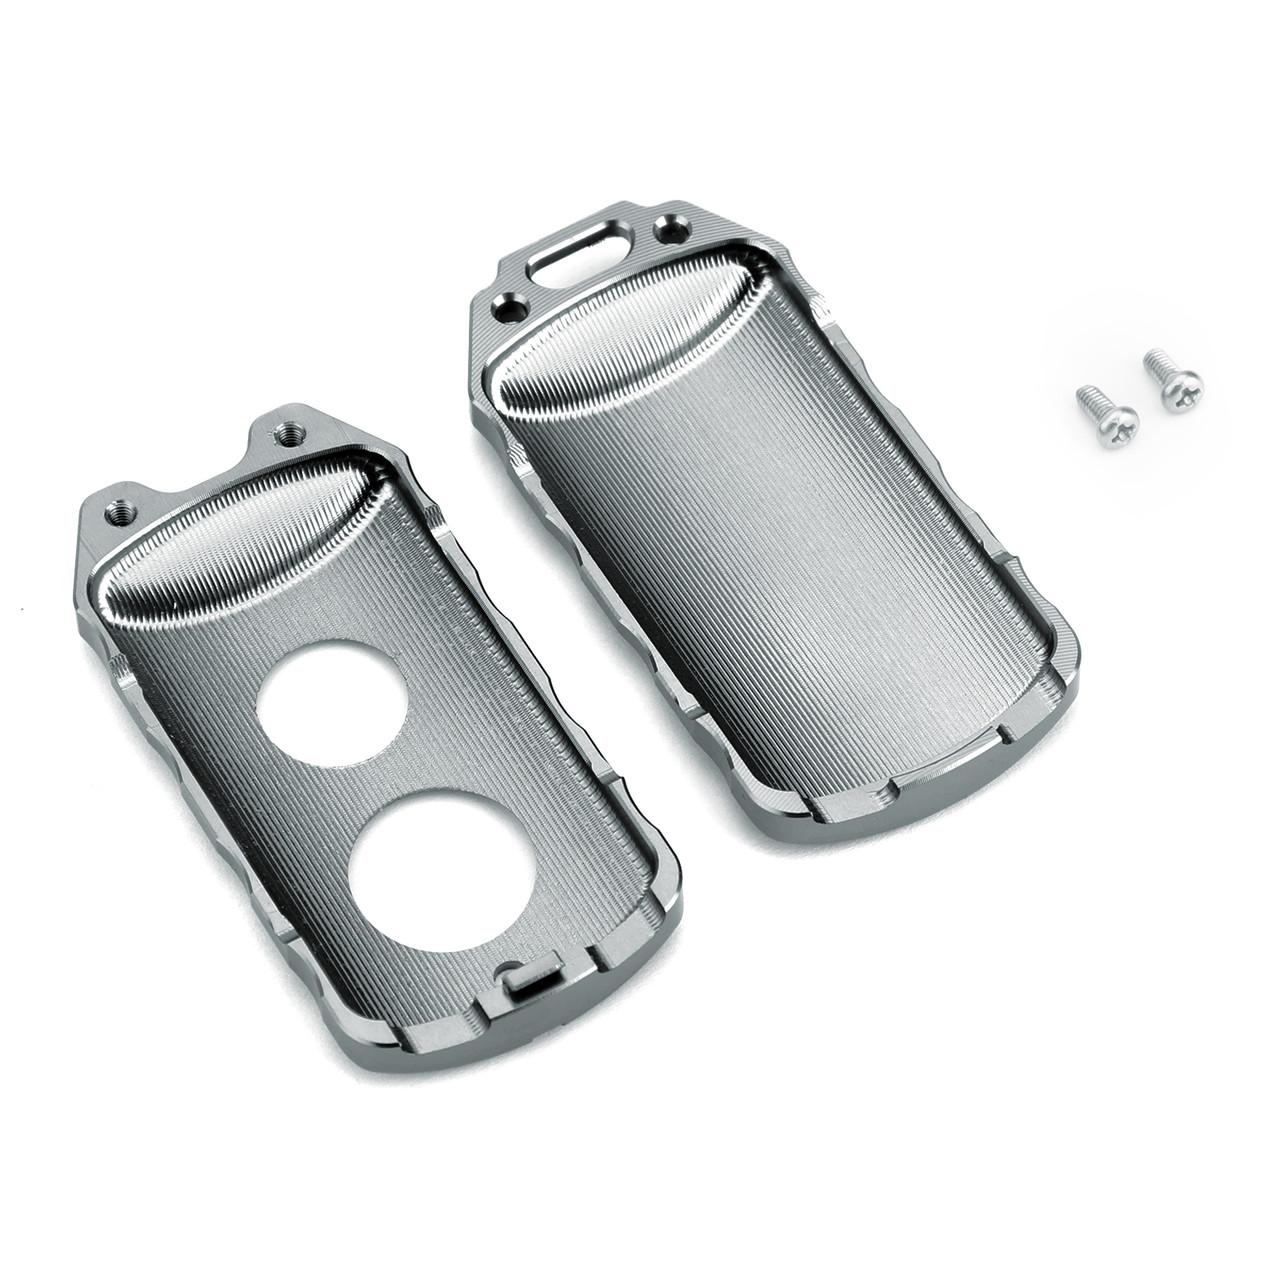 Key Case Cover Holder Protector For Yamaha NVX 155 AEROX 155 15-19 XMAX 125/250/300/400 17-19 Titanium